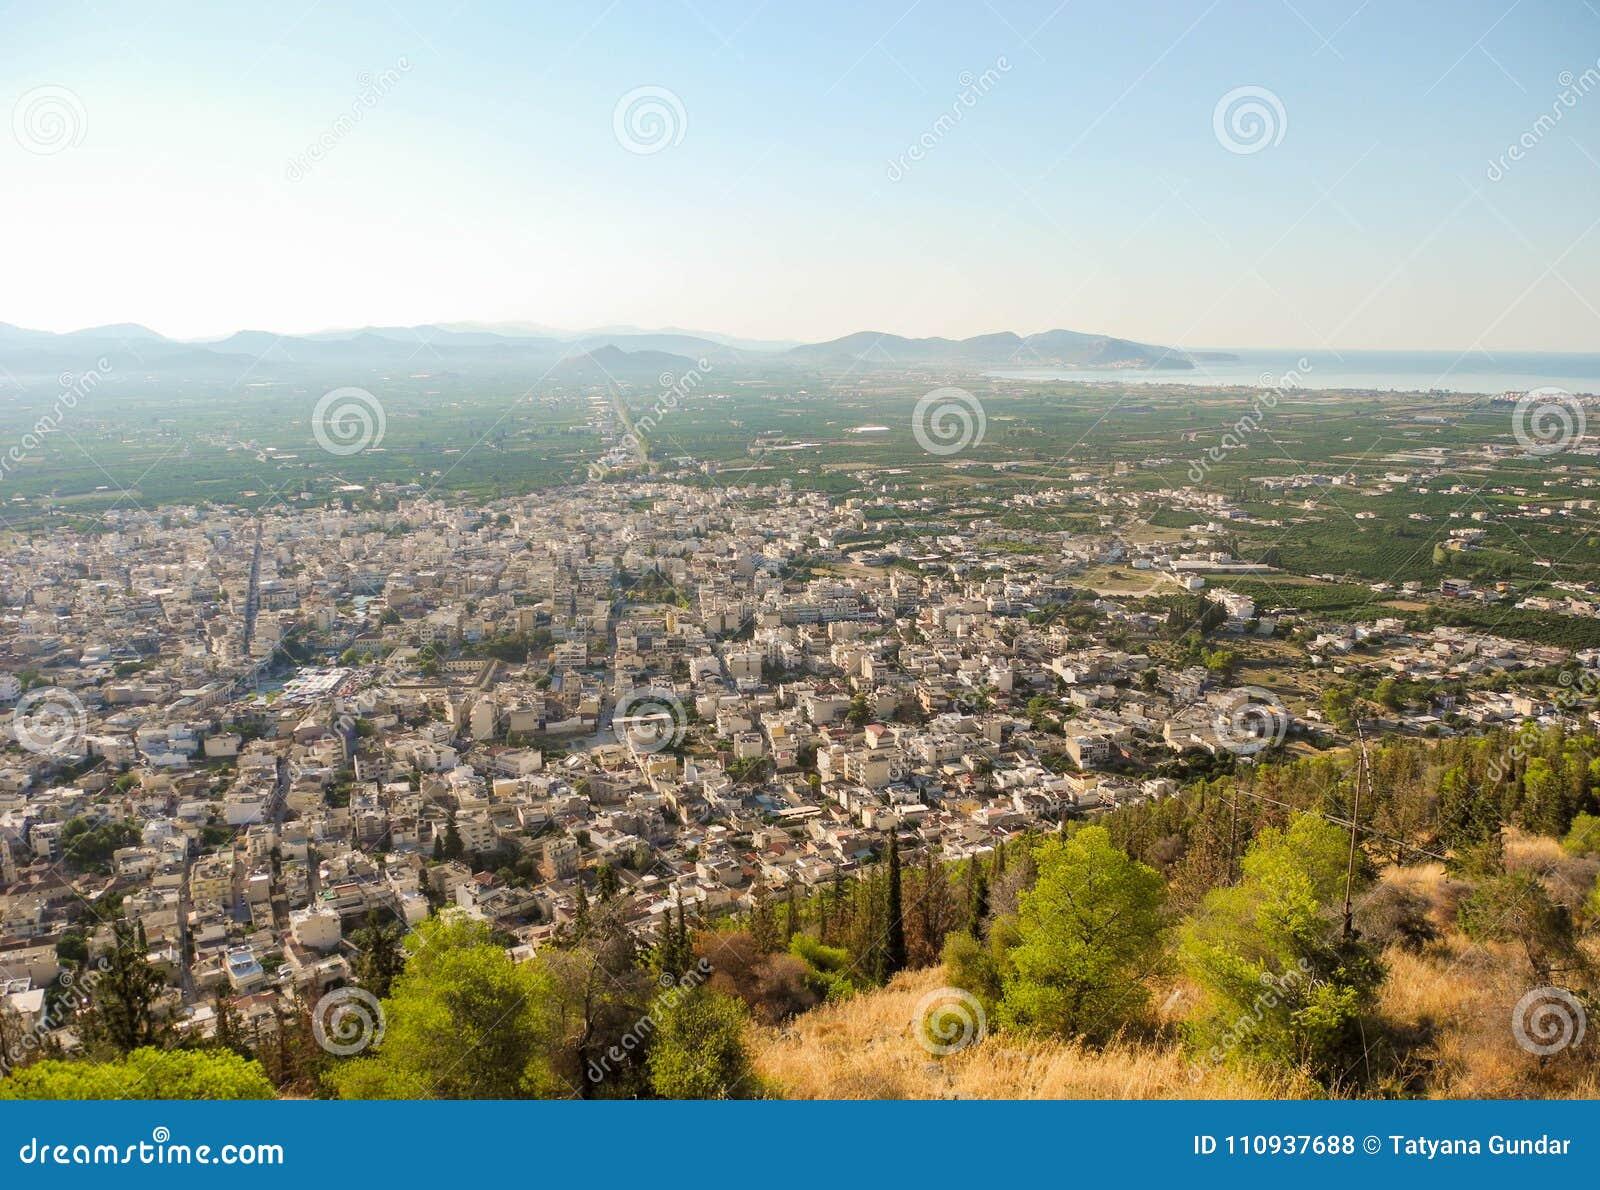 The Argos cityscape.